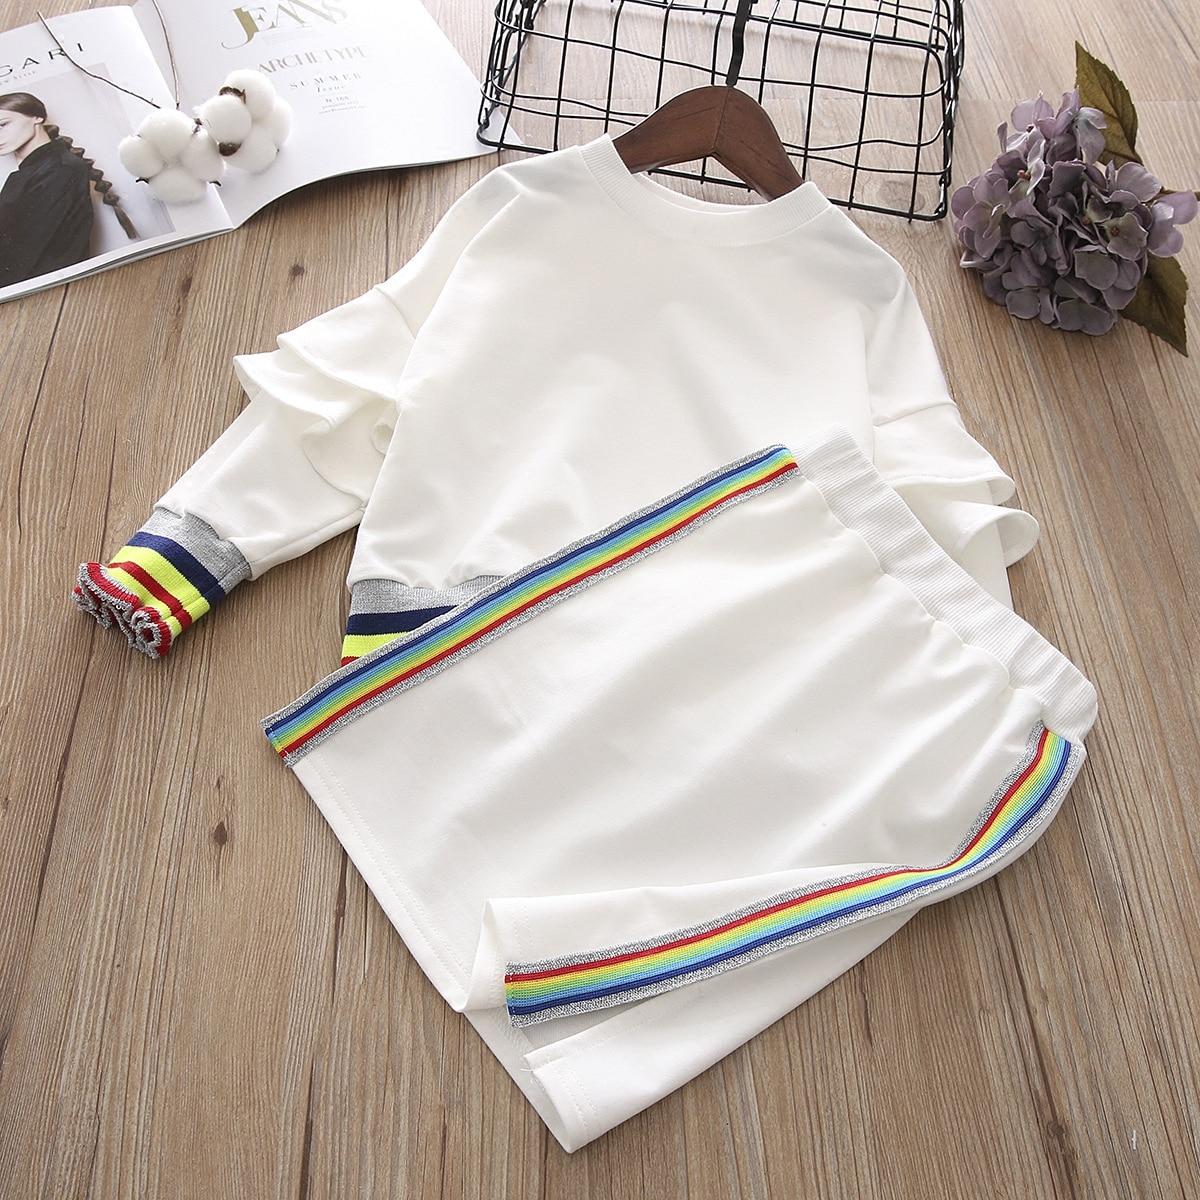 2018 new girl spring clothing set rainbow thread ruffled sleeve sweatshirts+hip skirts kids girls casual suits